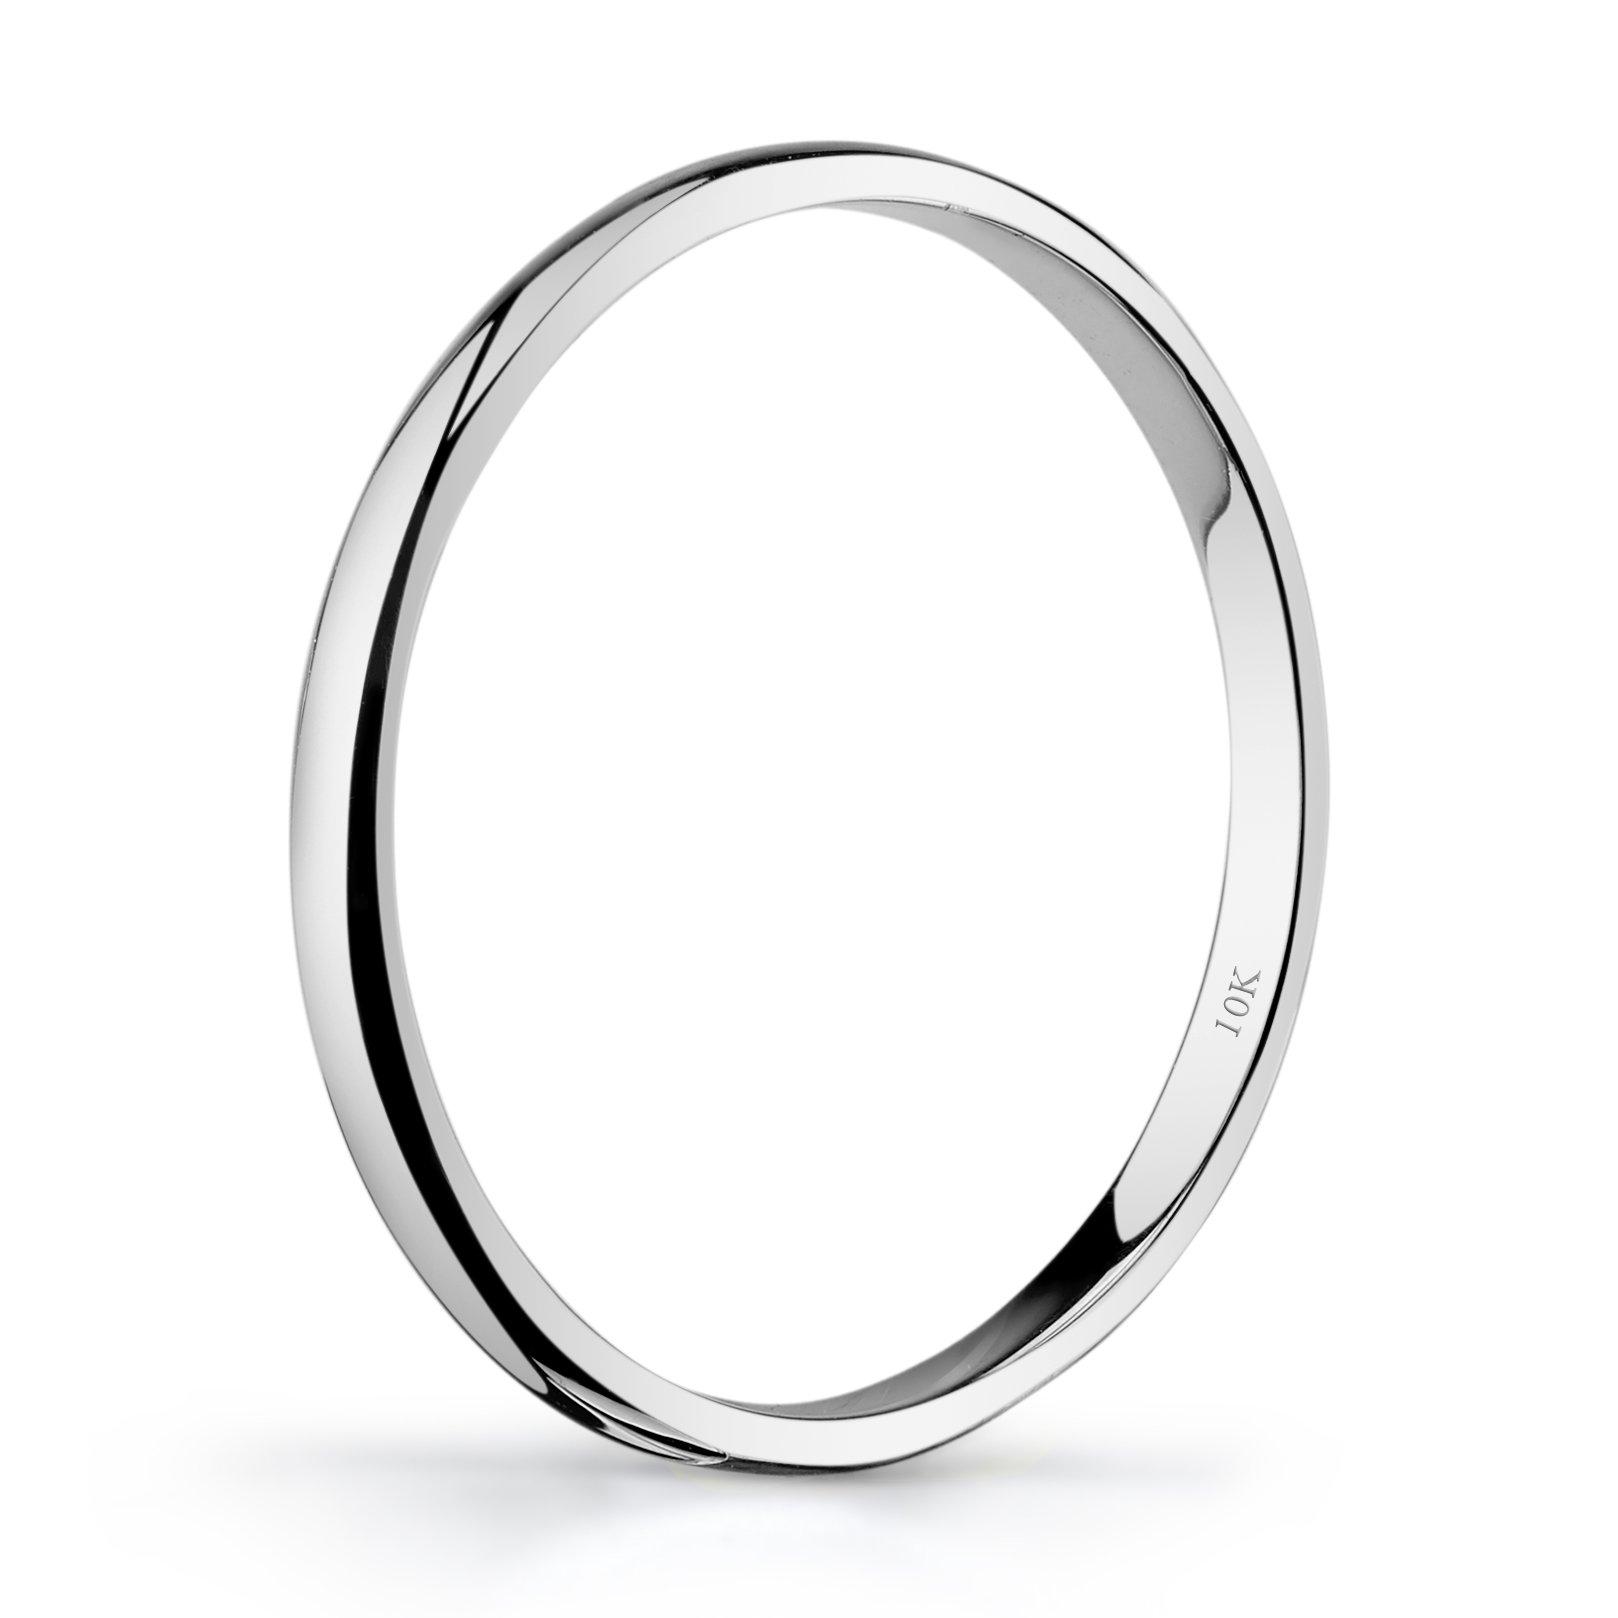 Tesori & Co 10k White Gold Light Comfort Fit 2mm Wedding Band Size 6 by Tesori & Co (Image #2)